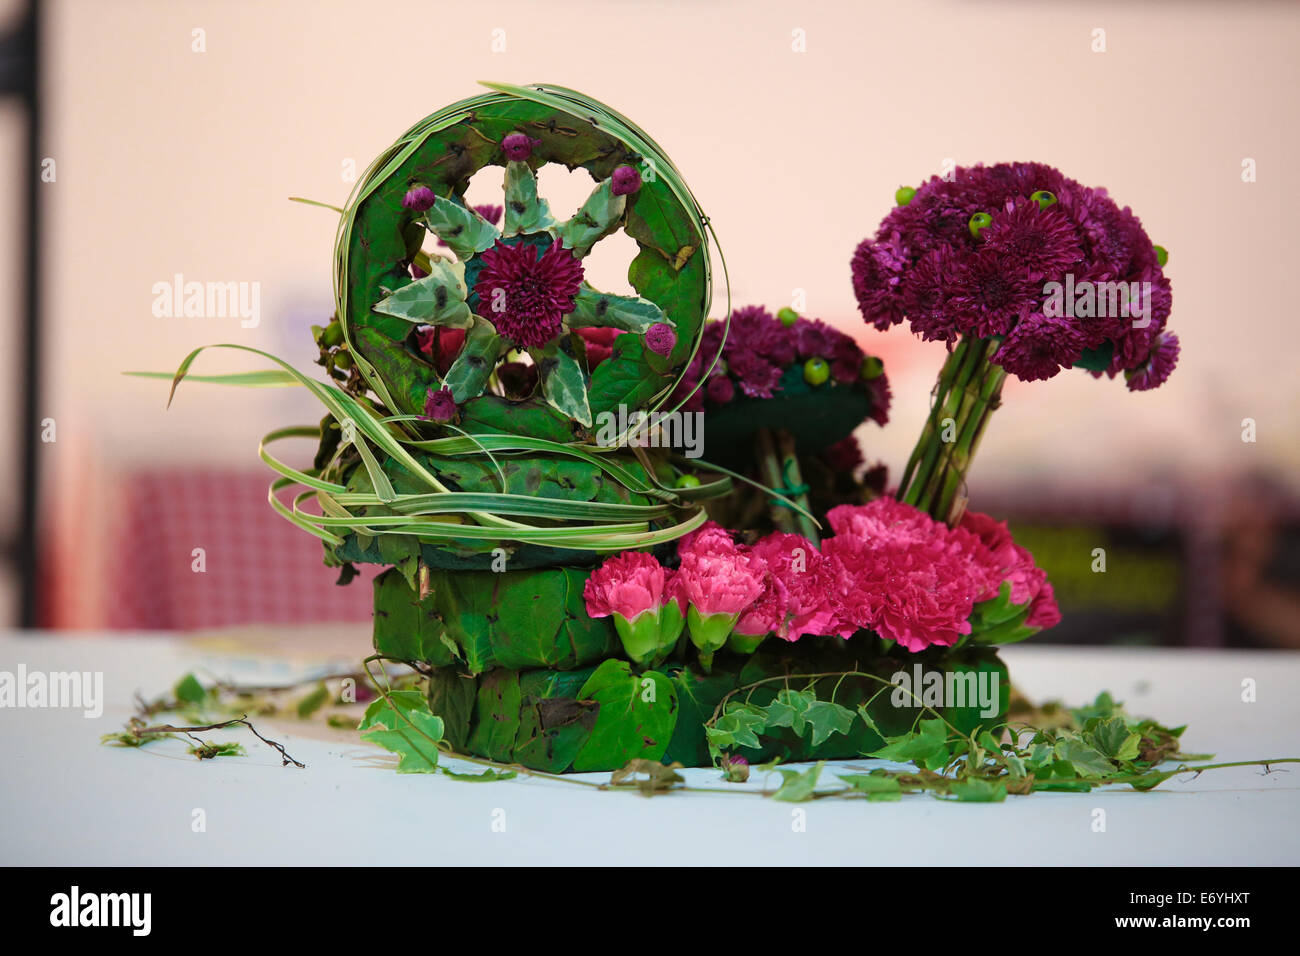 Tabletop Flower Arrangements Stock Photo: 73136192   Alamy